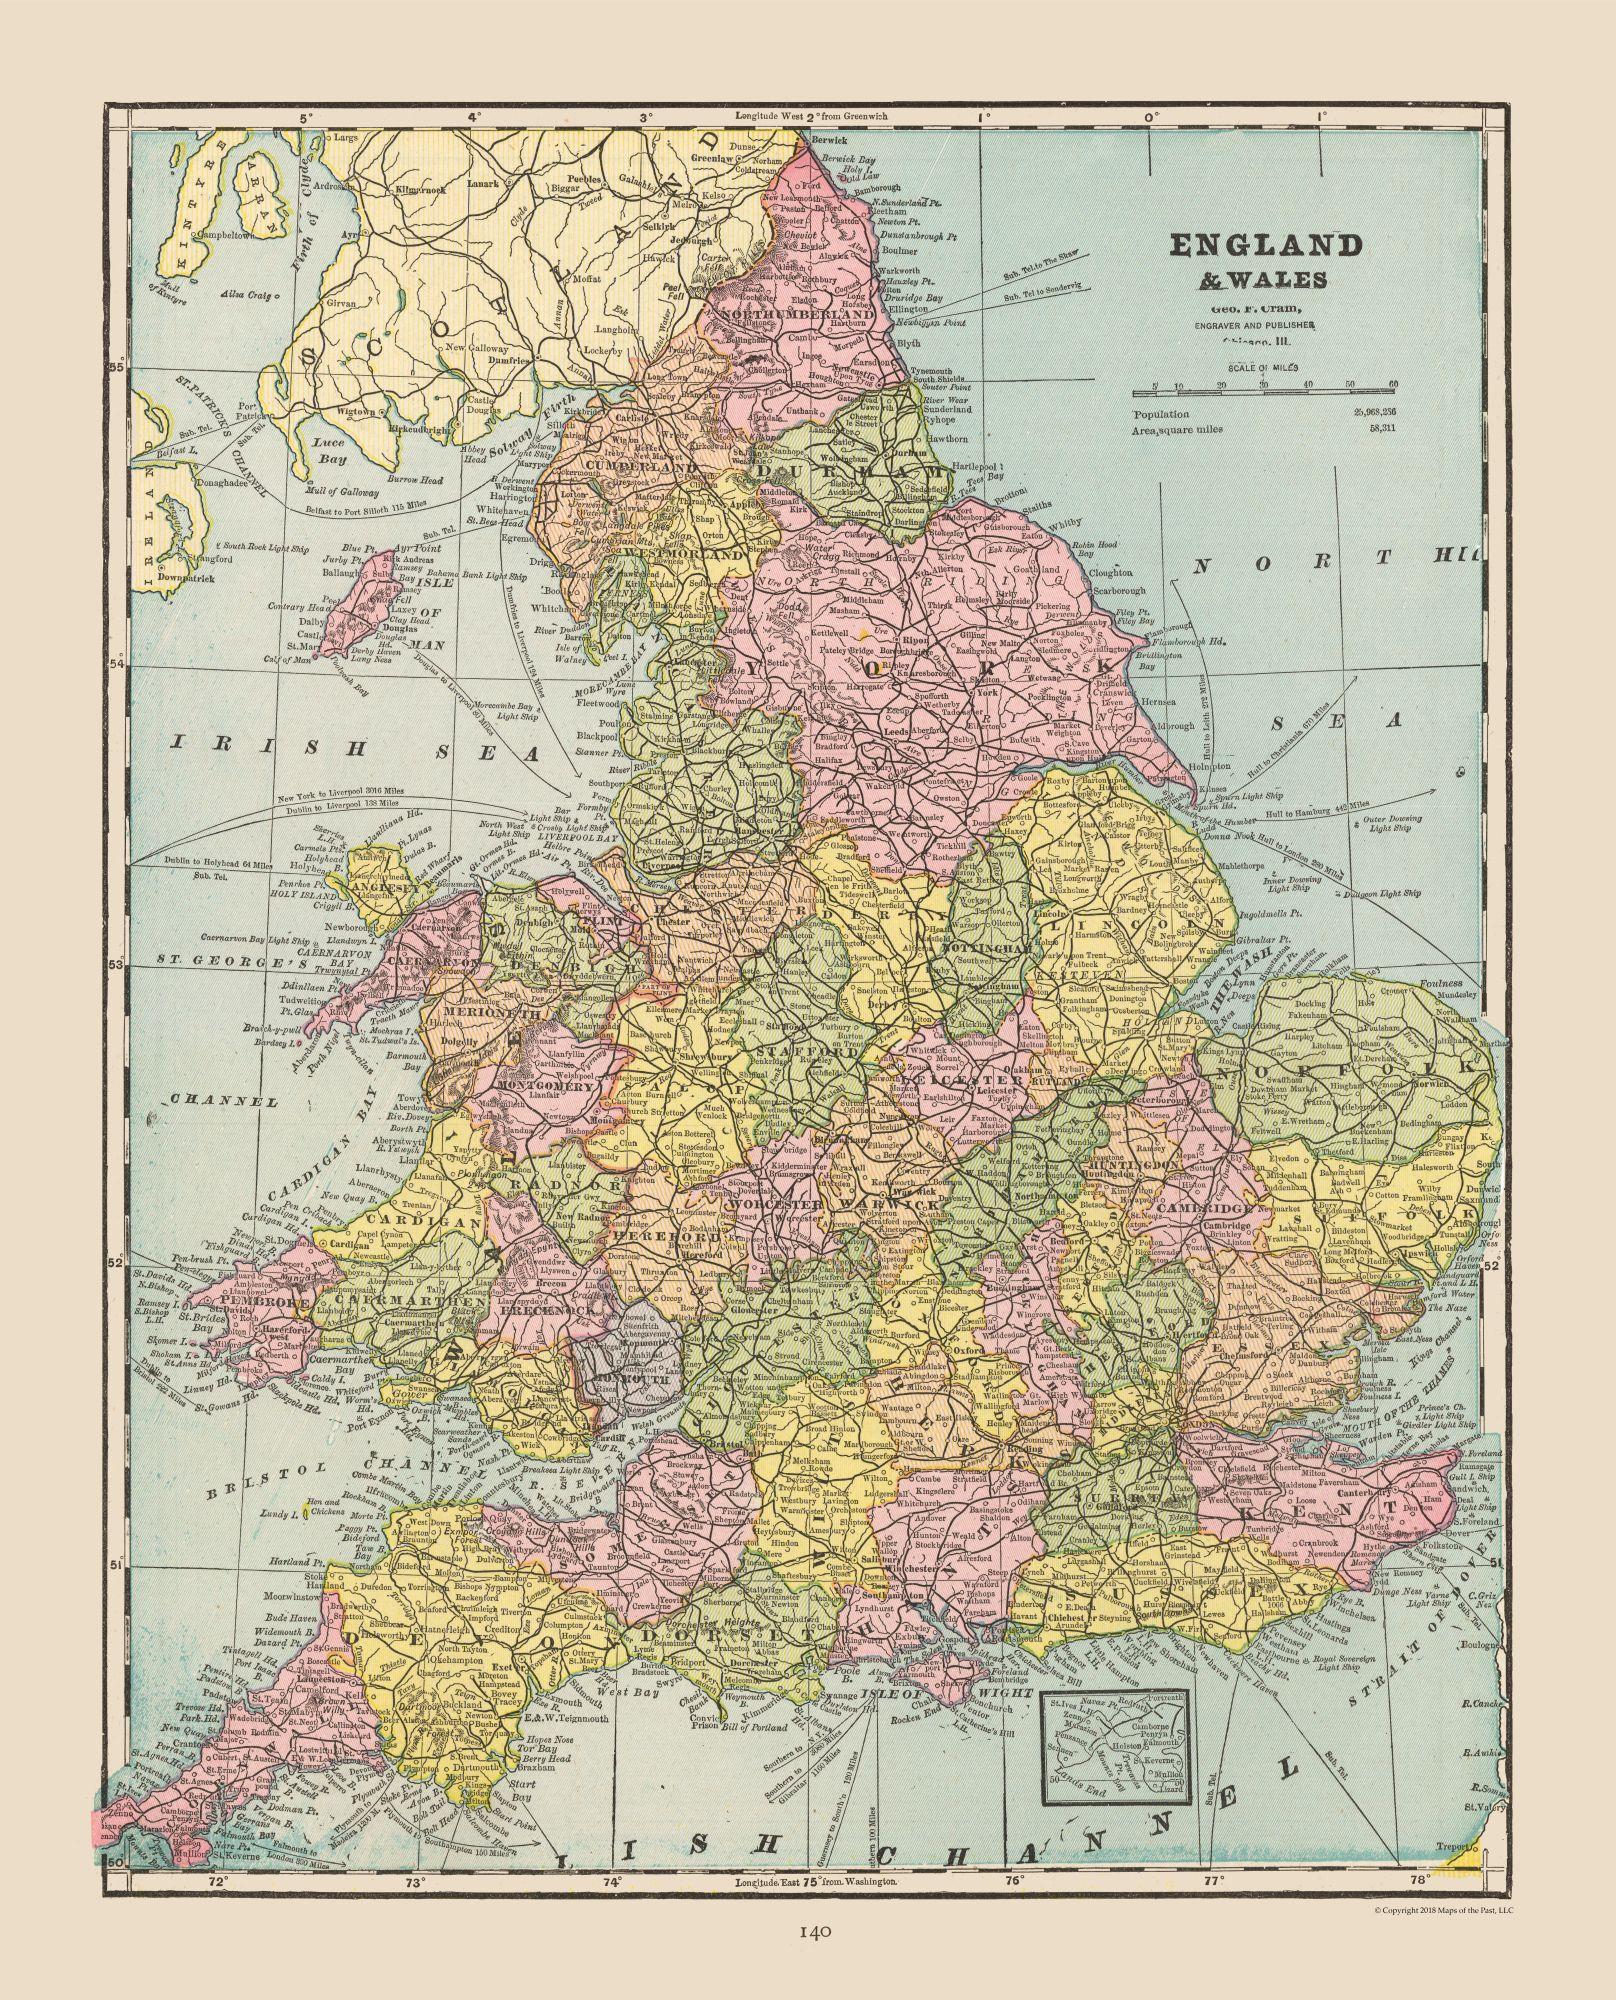 Full Map Of England.International Map England Wales Cram 1892 23 X 28 47